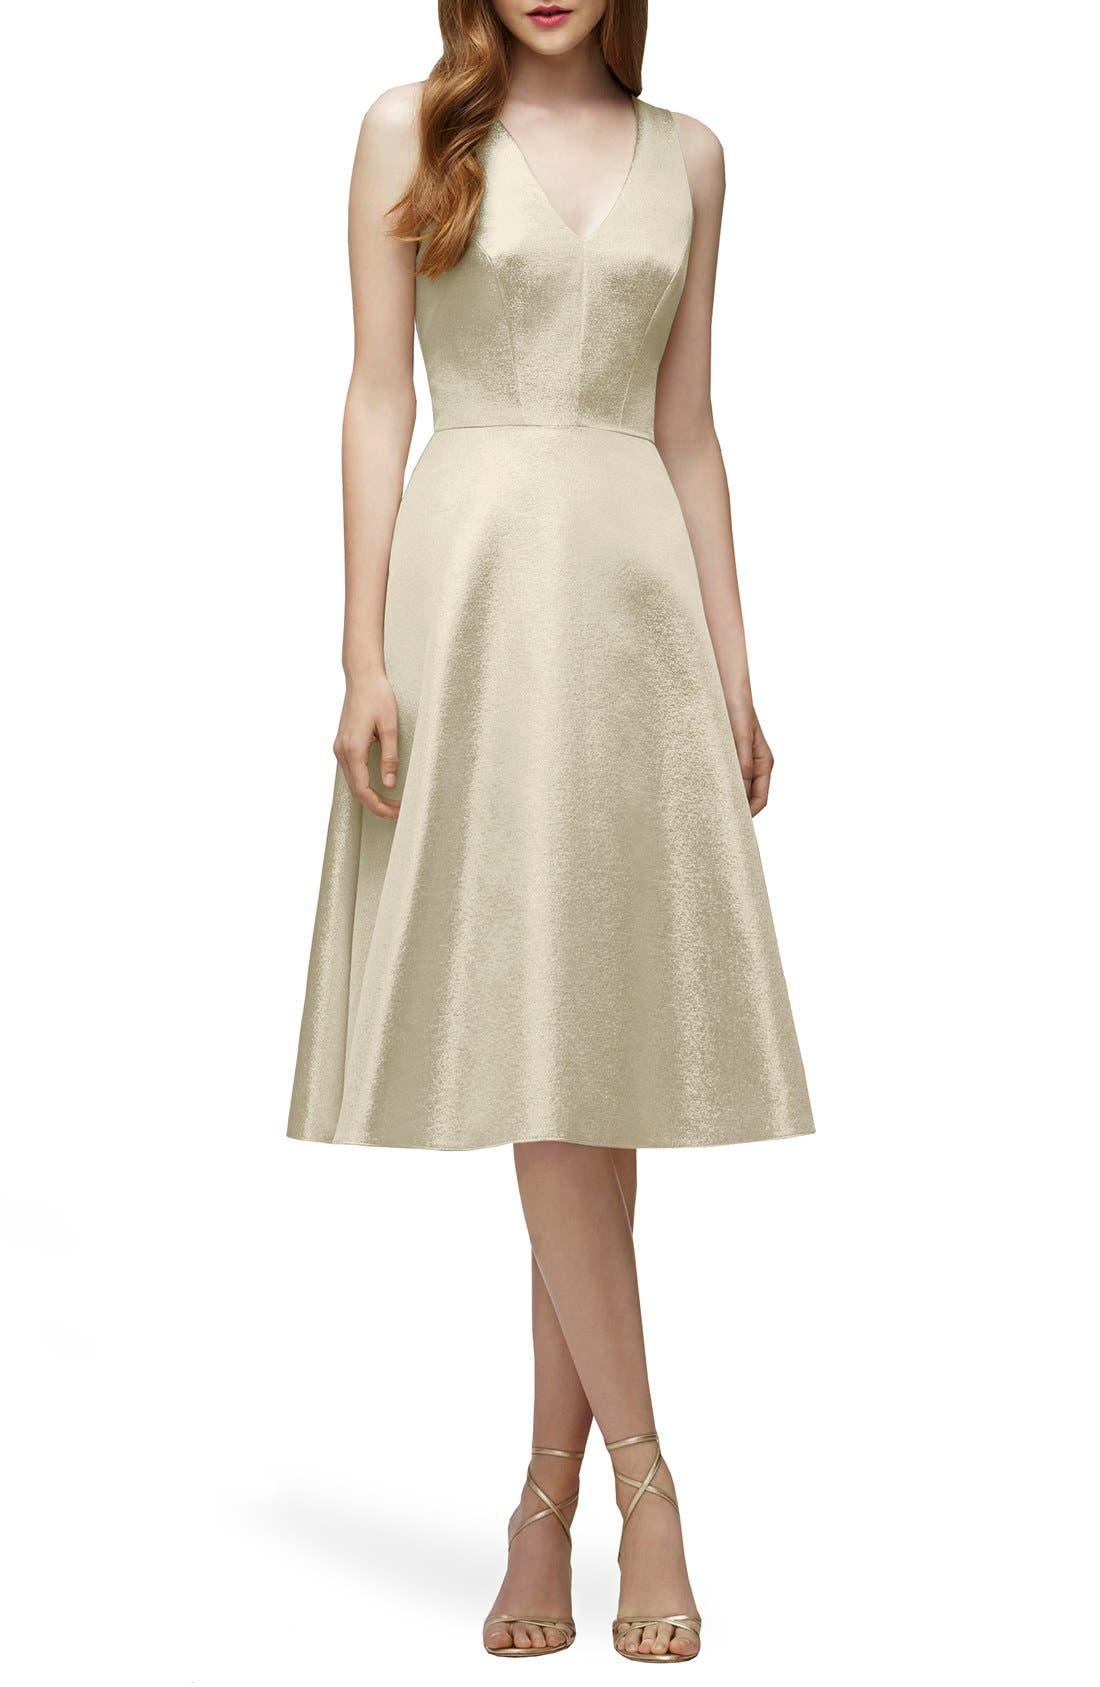 Alternate Image 1 Selected - Lela Rose Bridesmaid V-Neck Metallic Fit & Flare Dress